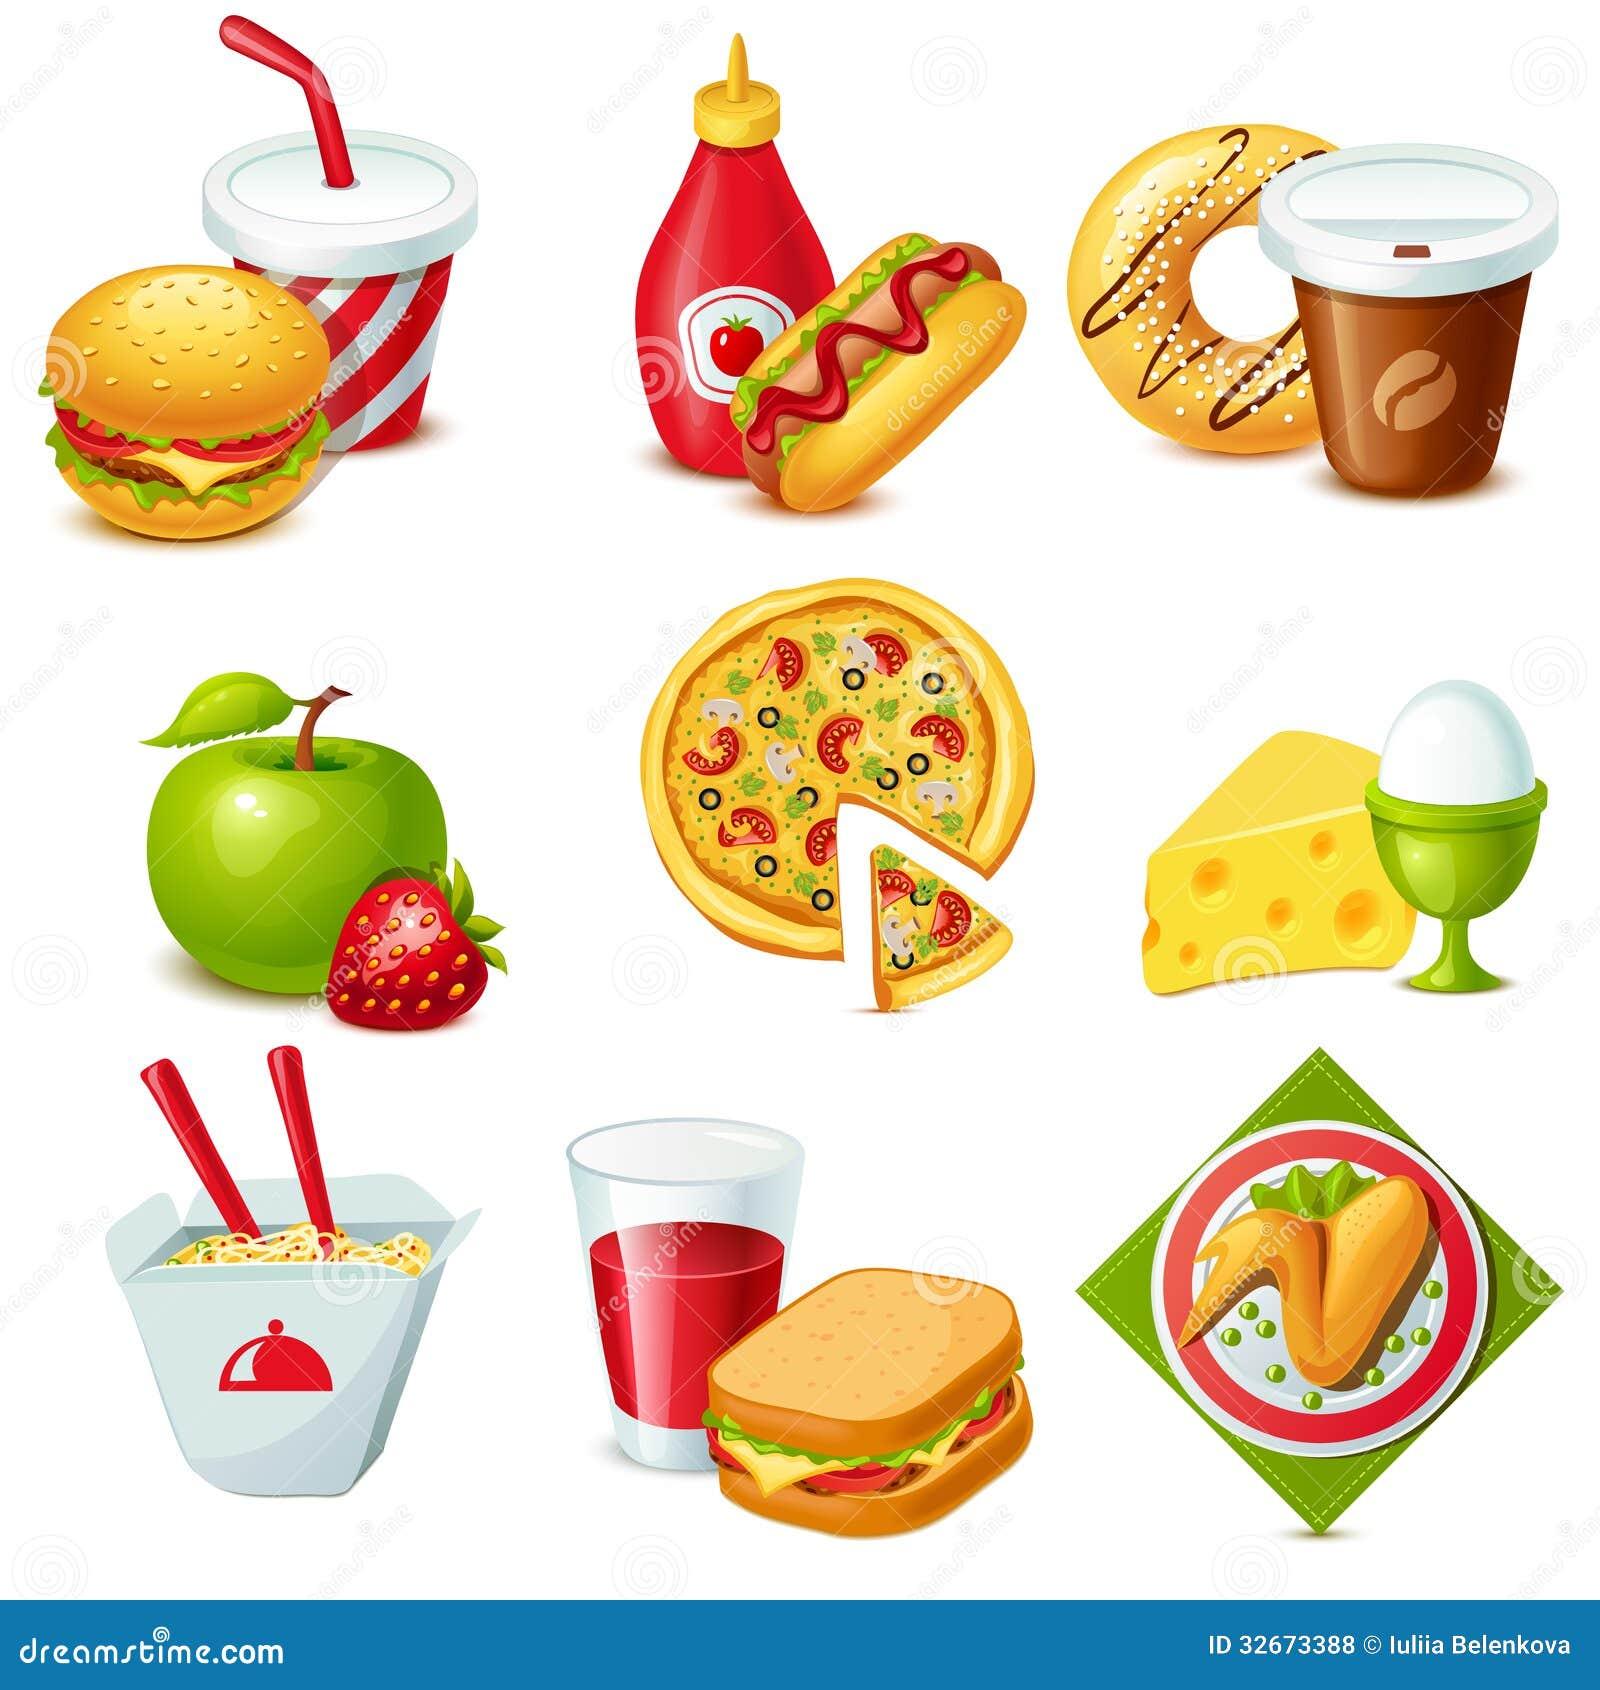 set of 9 colorful food icons mr no pr no 4 2830 17